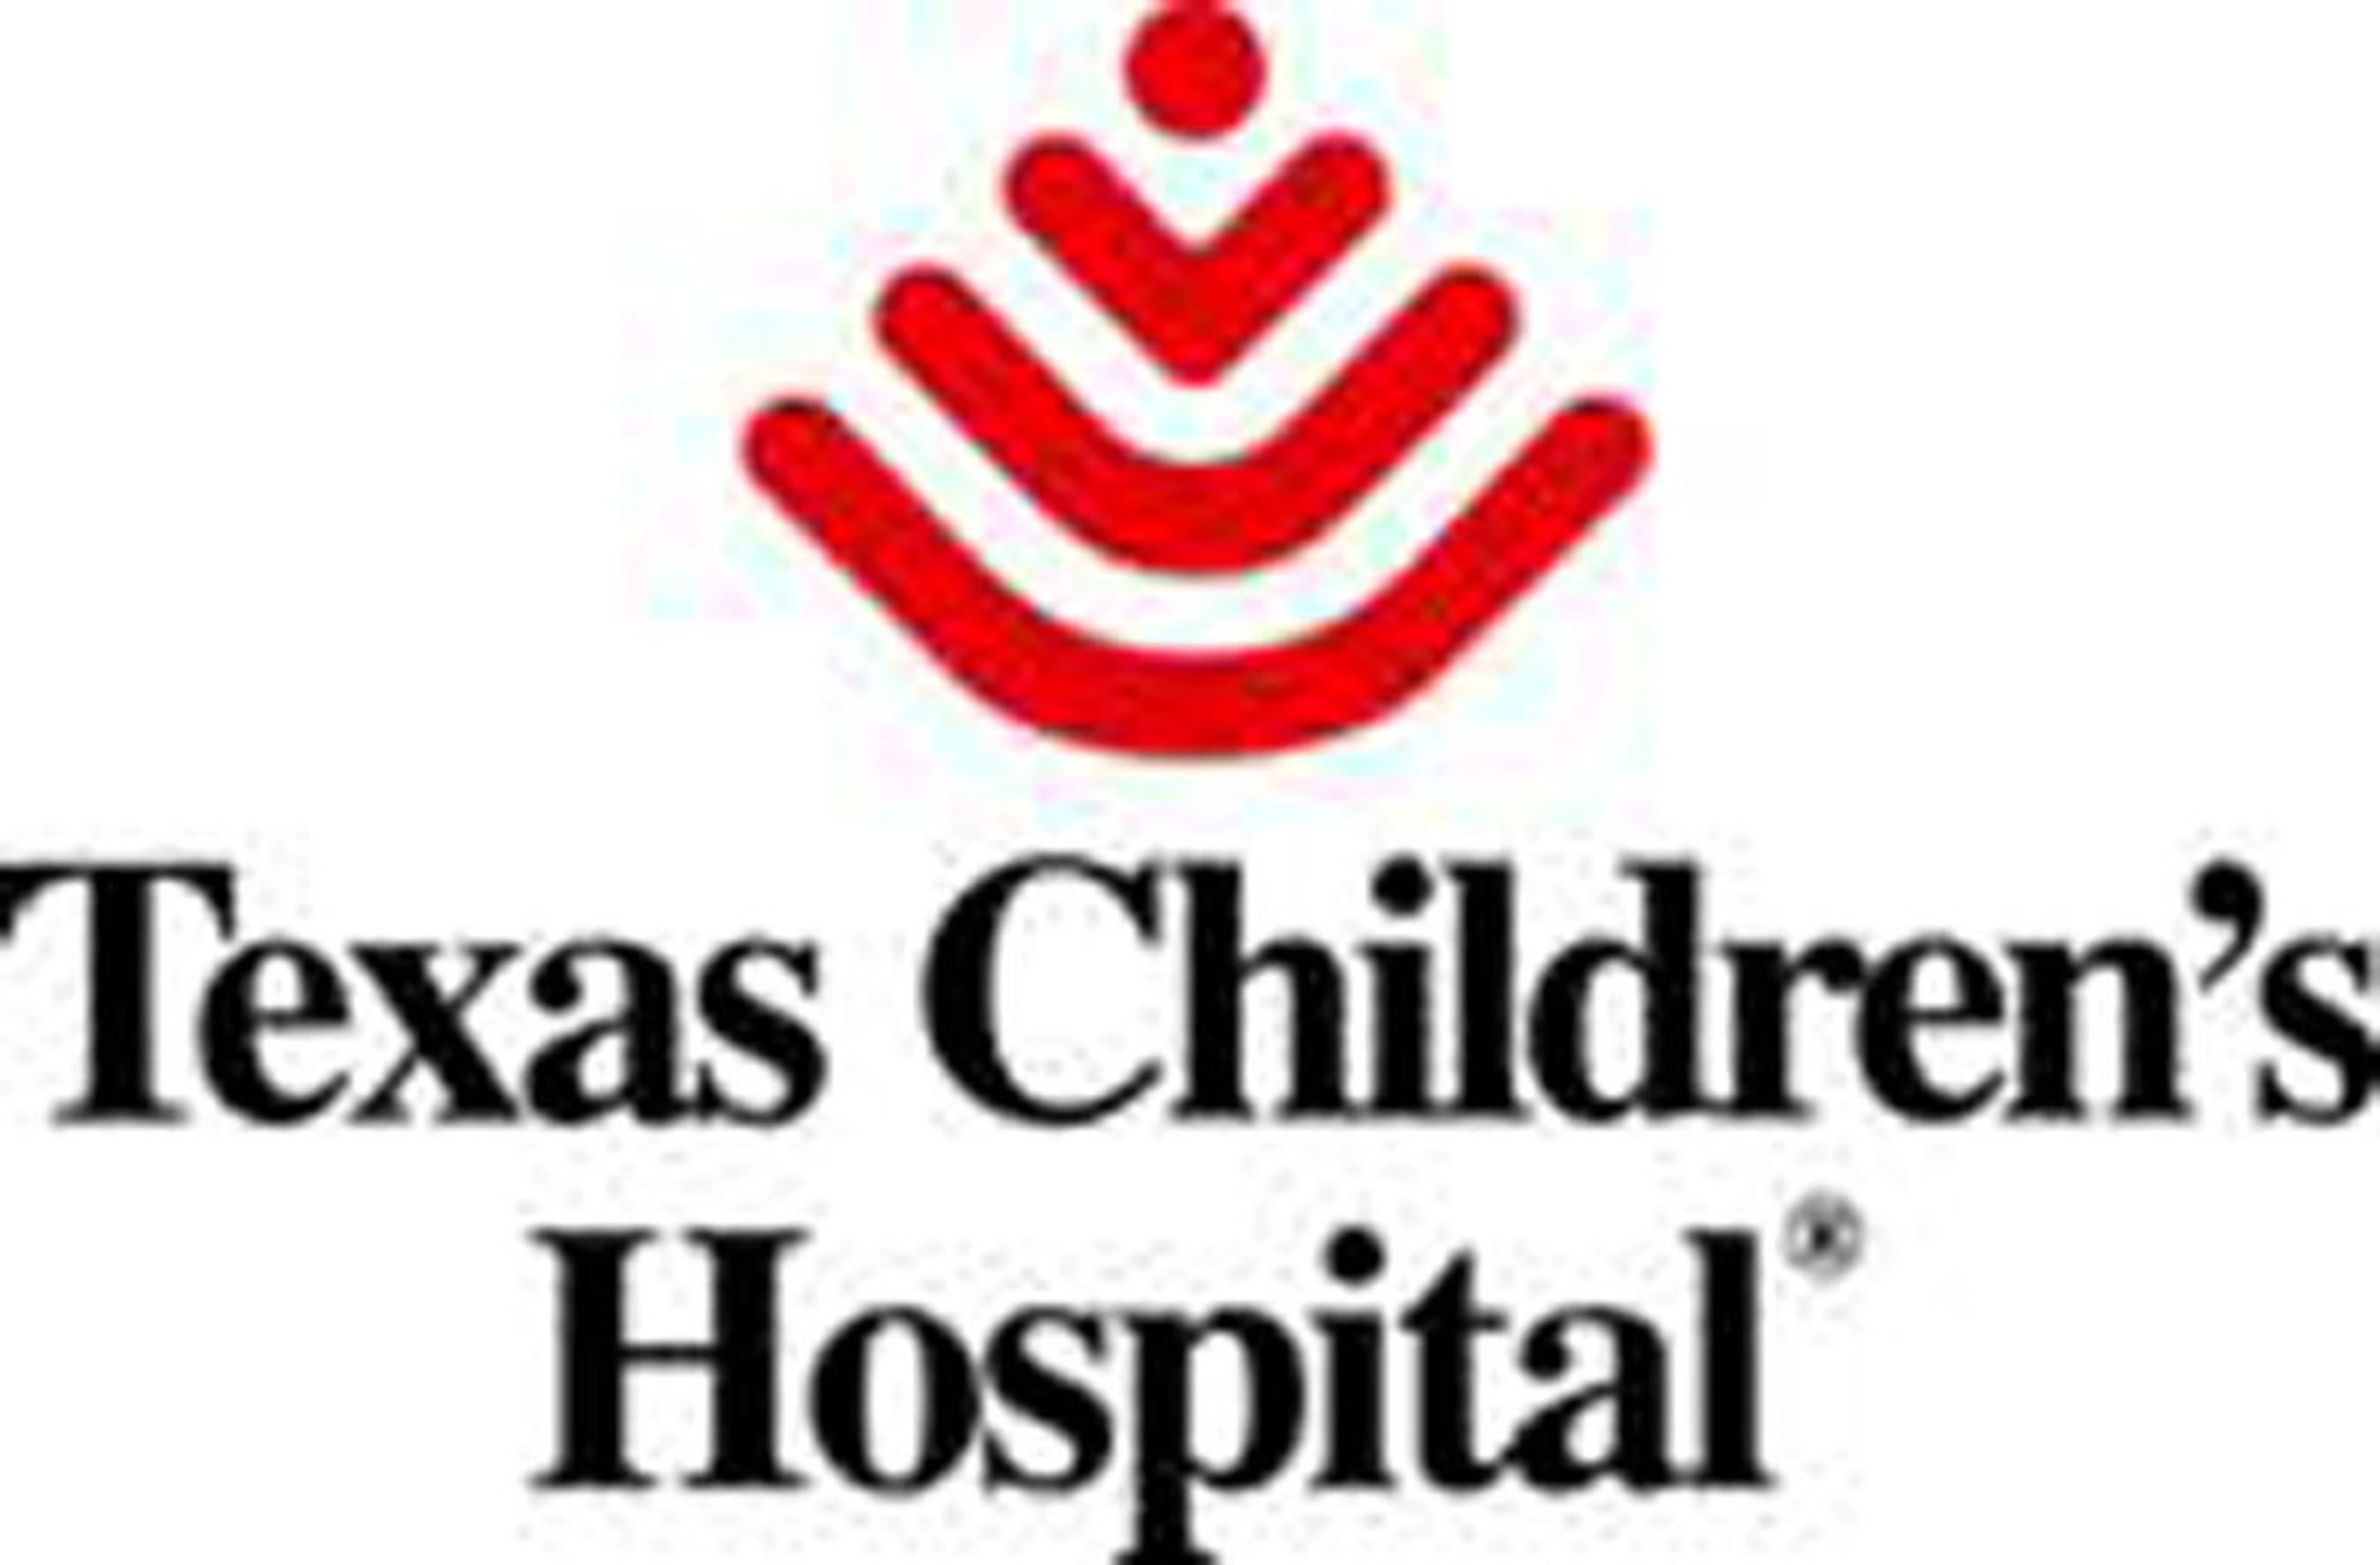 Texas Children's Hospital Logo. (PRNewsFoto/Texas Children's Hospital) (PRNewsFoto/TEXAS CHILDREN'S HOSPITAL)